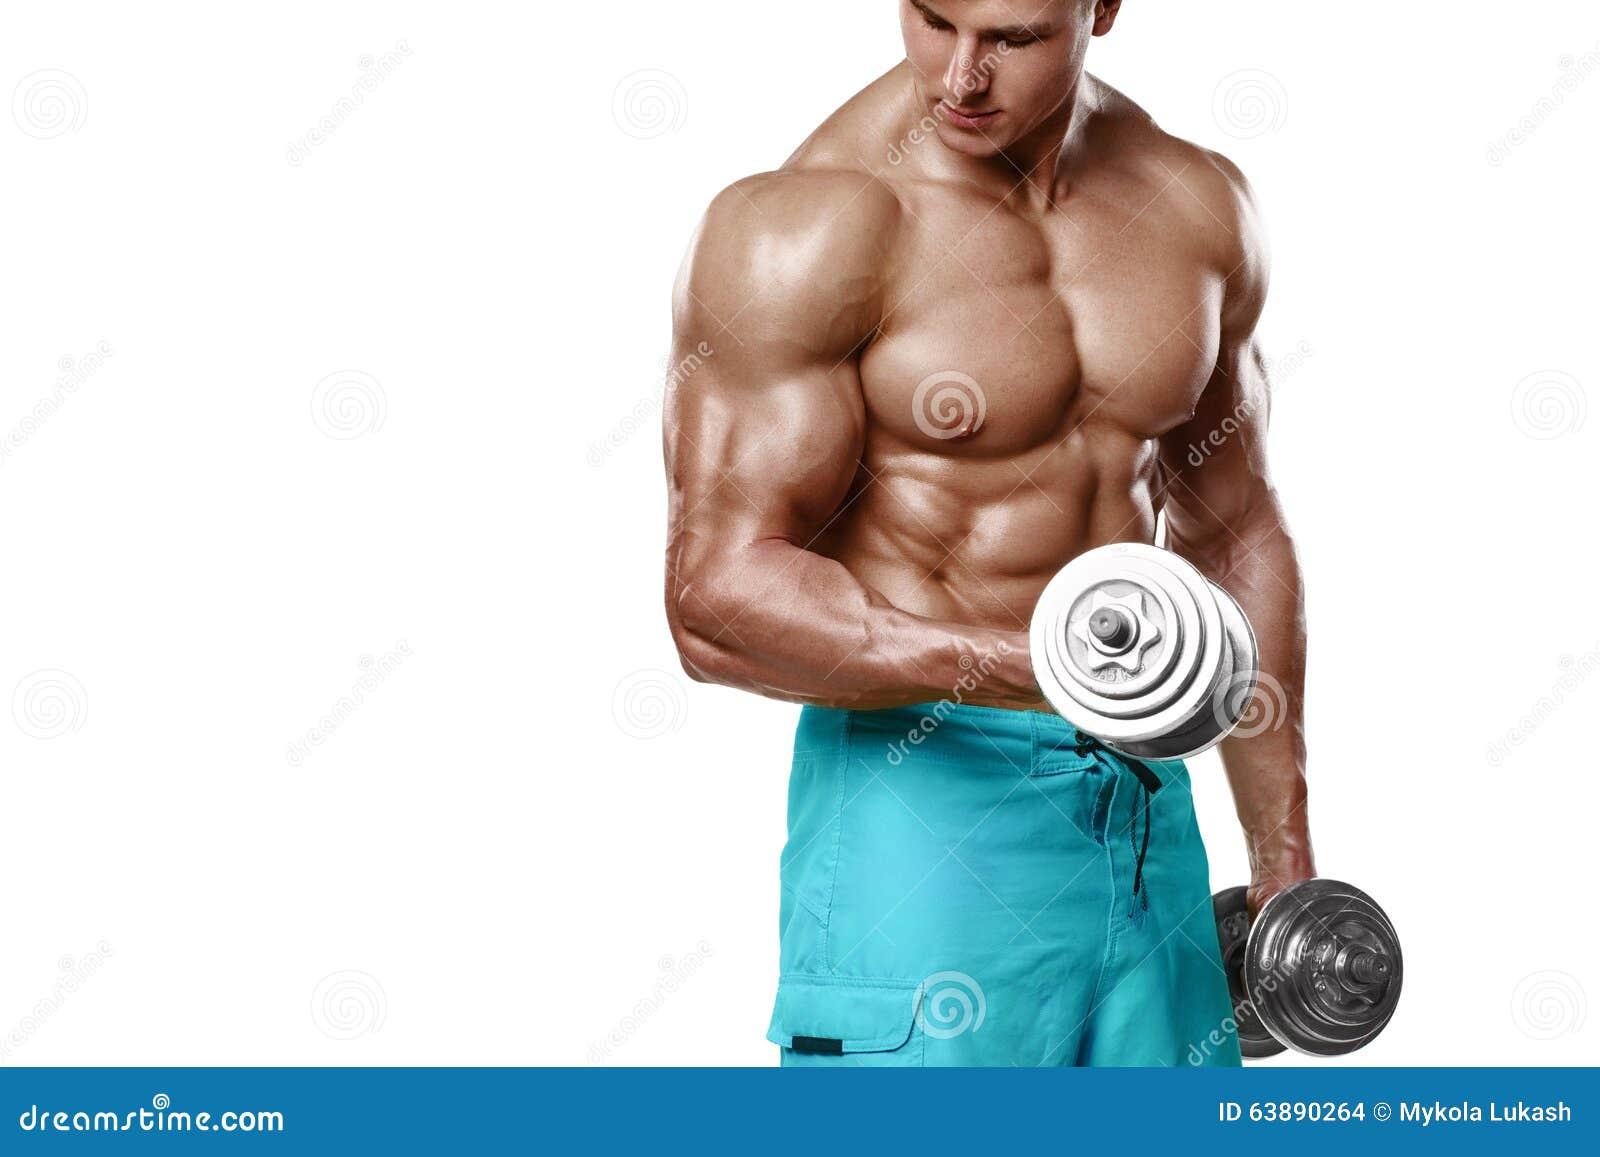 Doing Naked Exercises 109